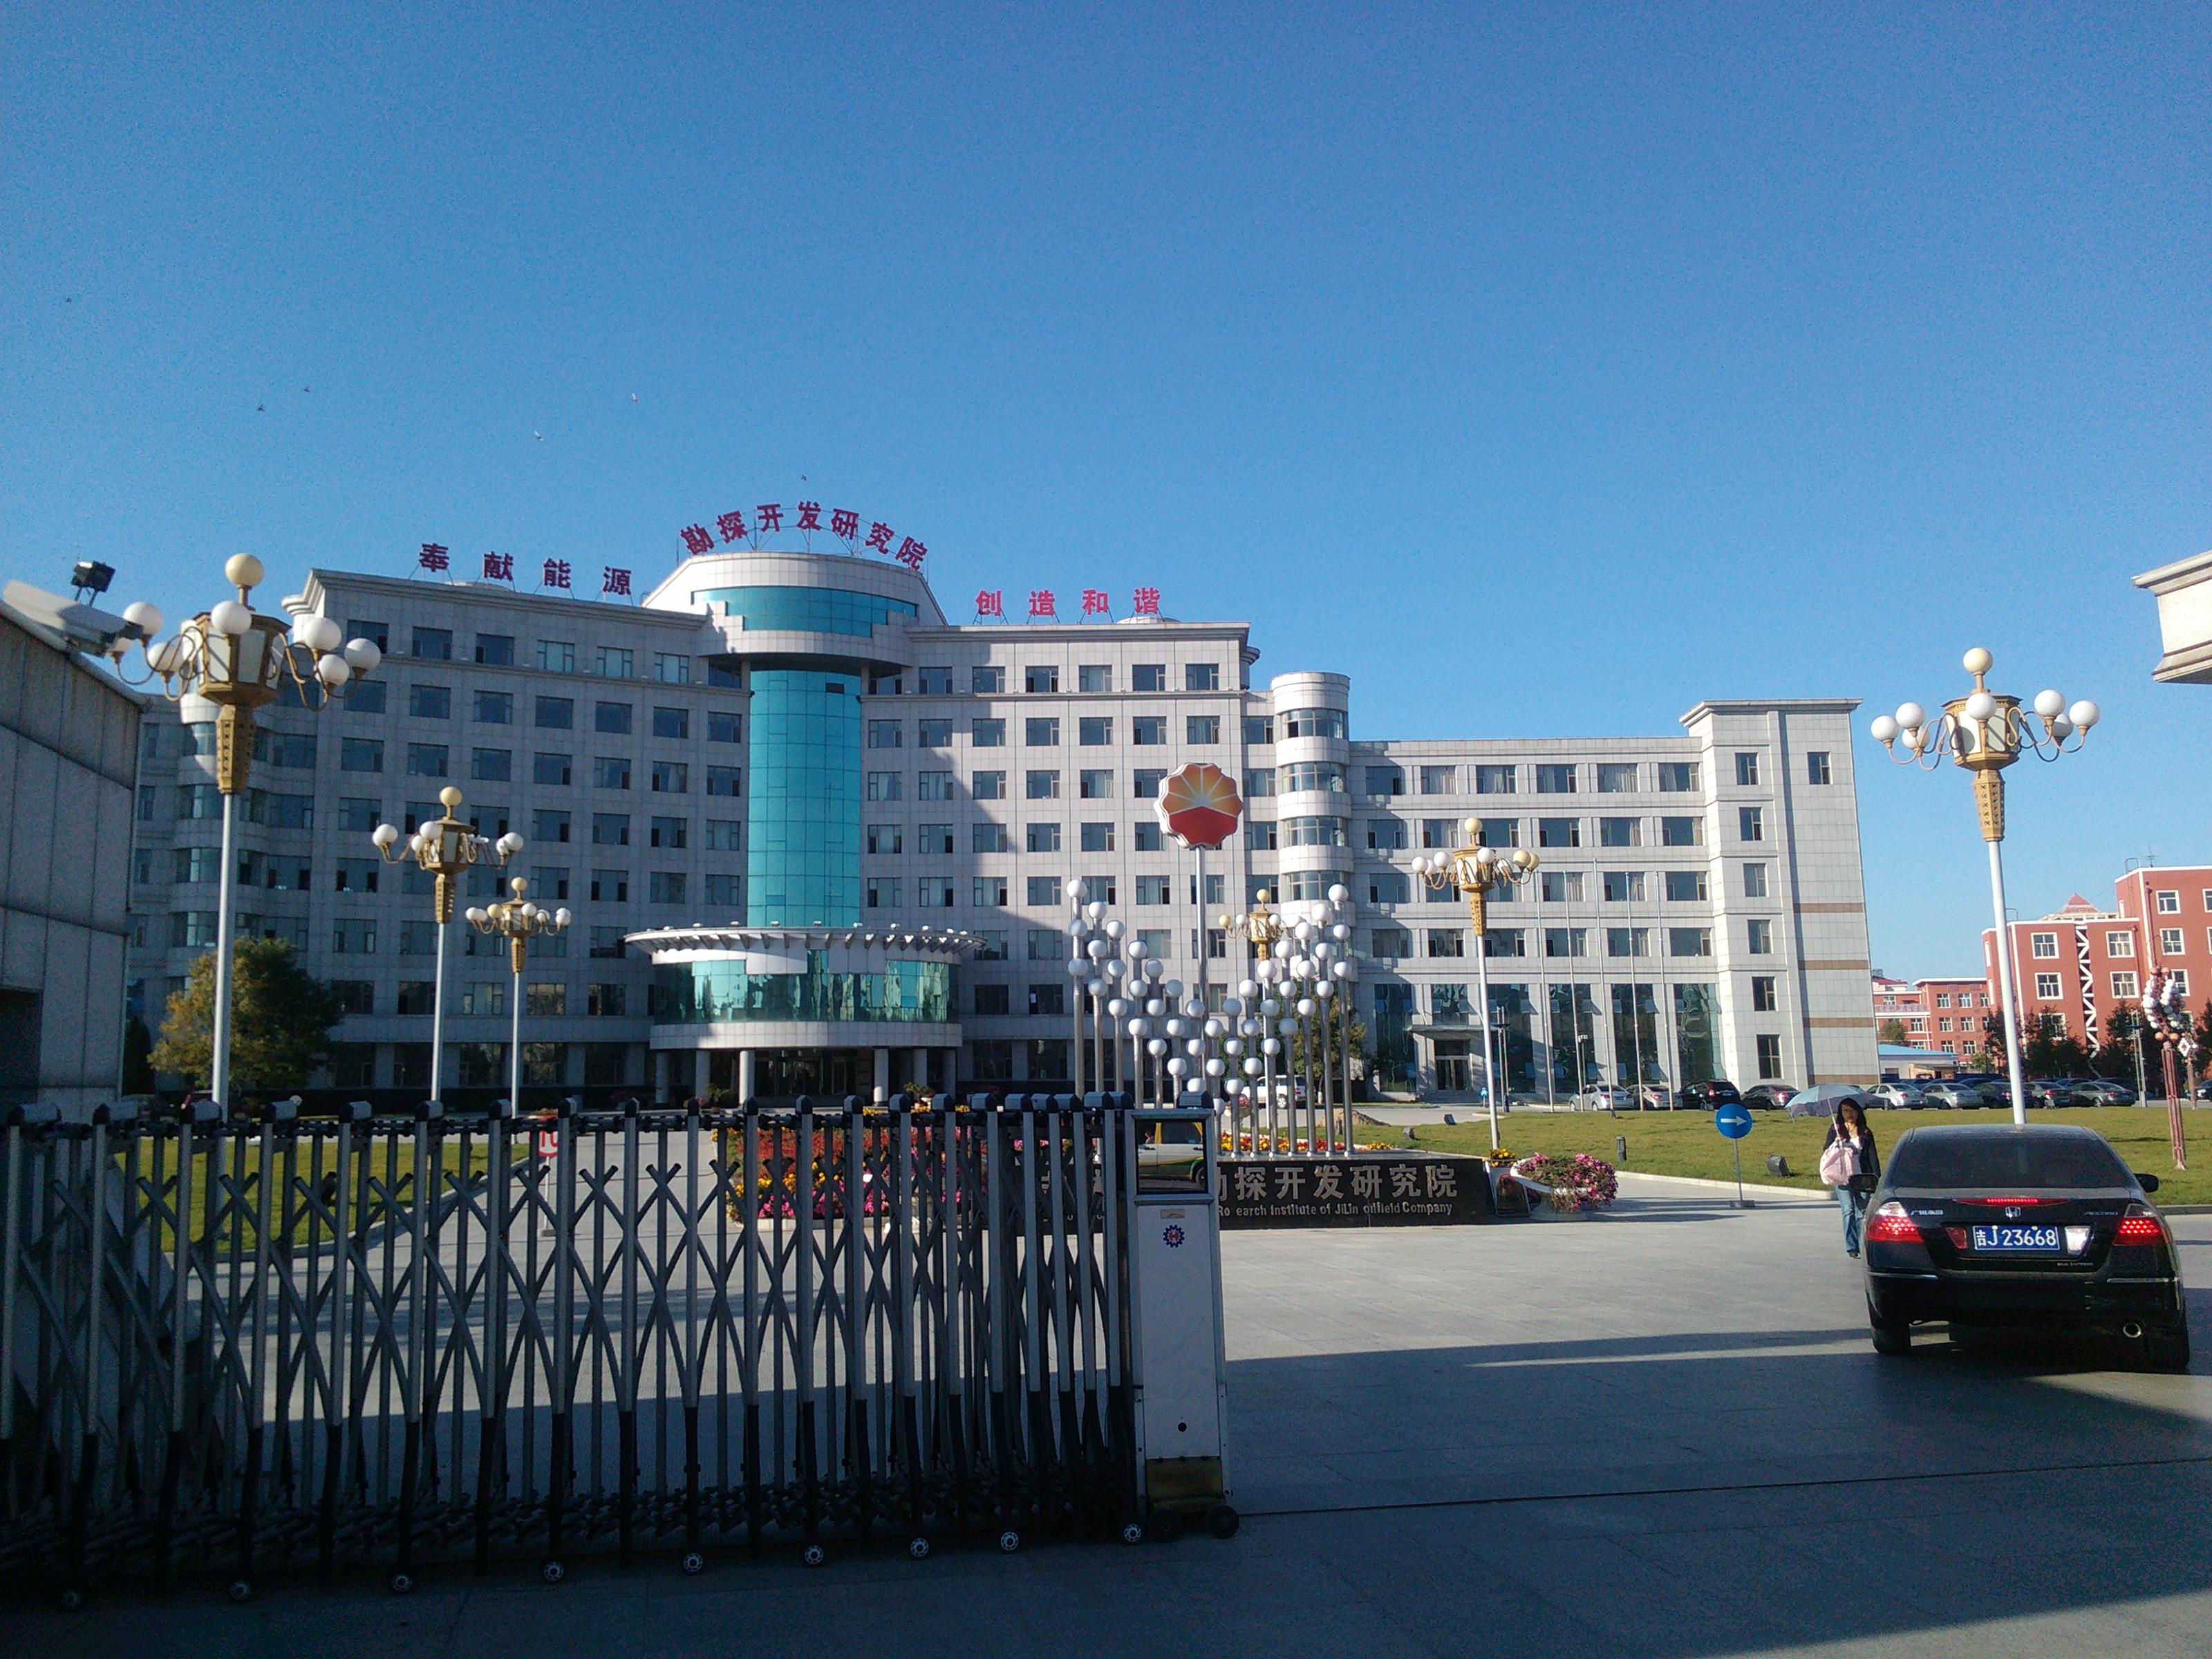 Songyuan jilin